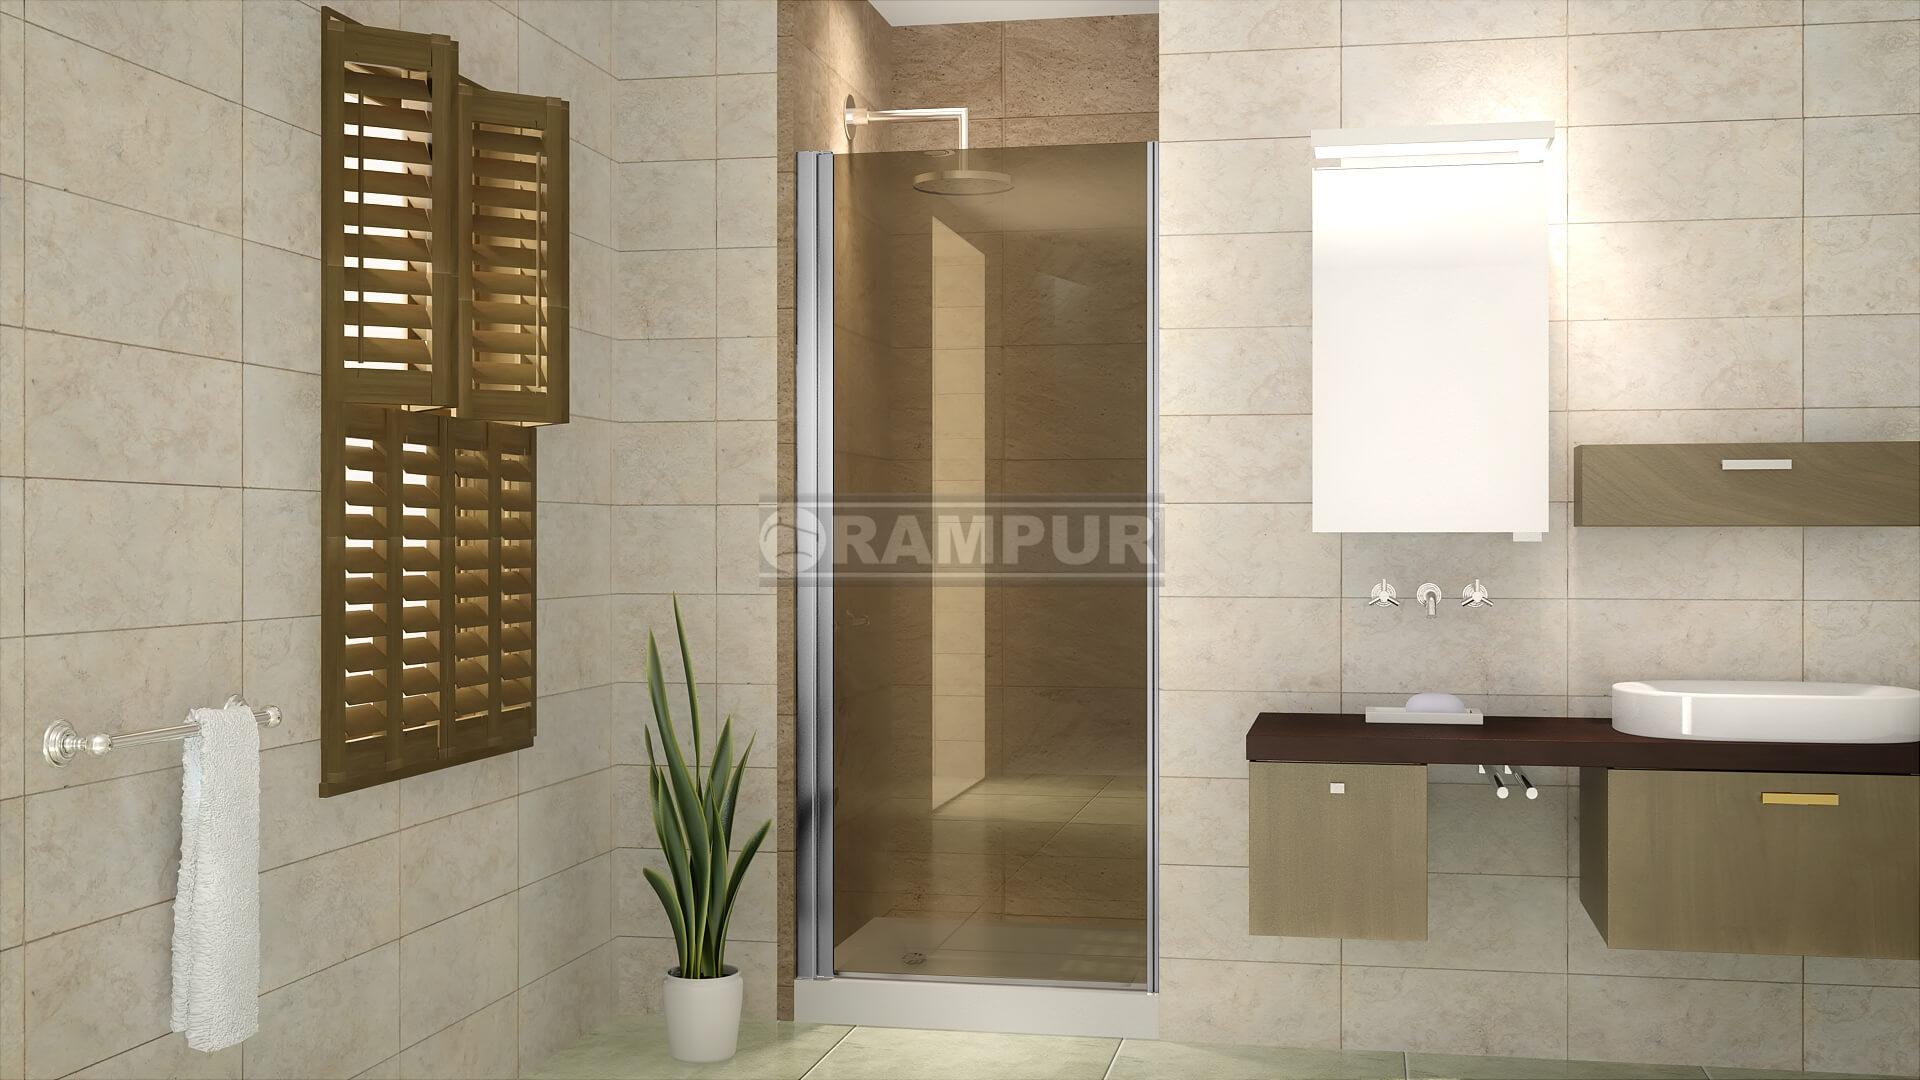 Rampur puertas para duchas de vidrio parana est ndar - Vidrios para duchas ...